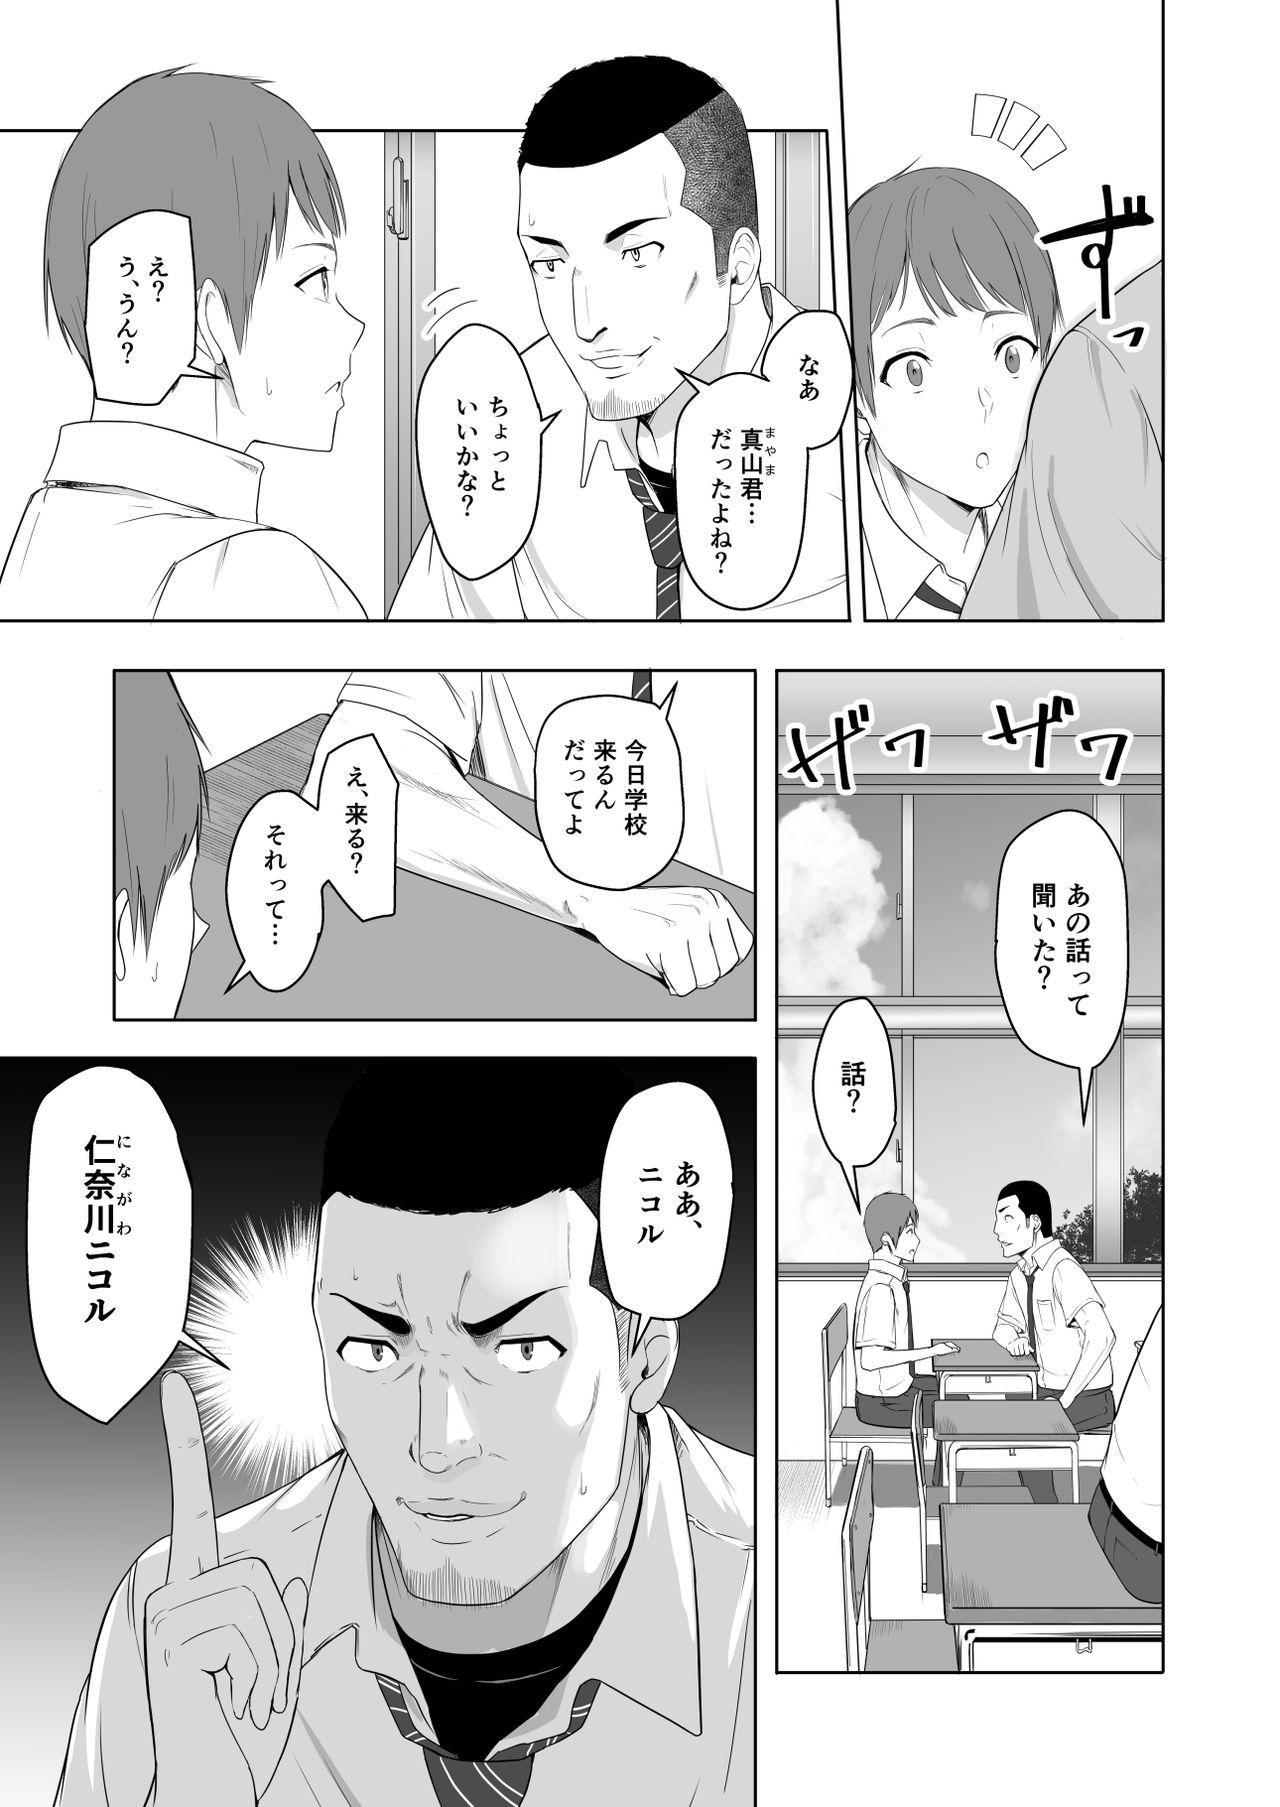 Kimi ga Tame. 2 Ichikawa Inori 5